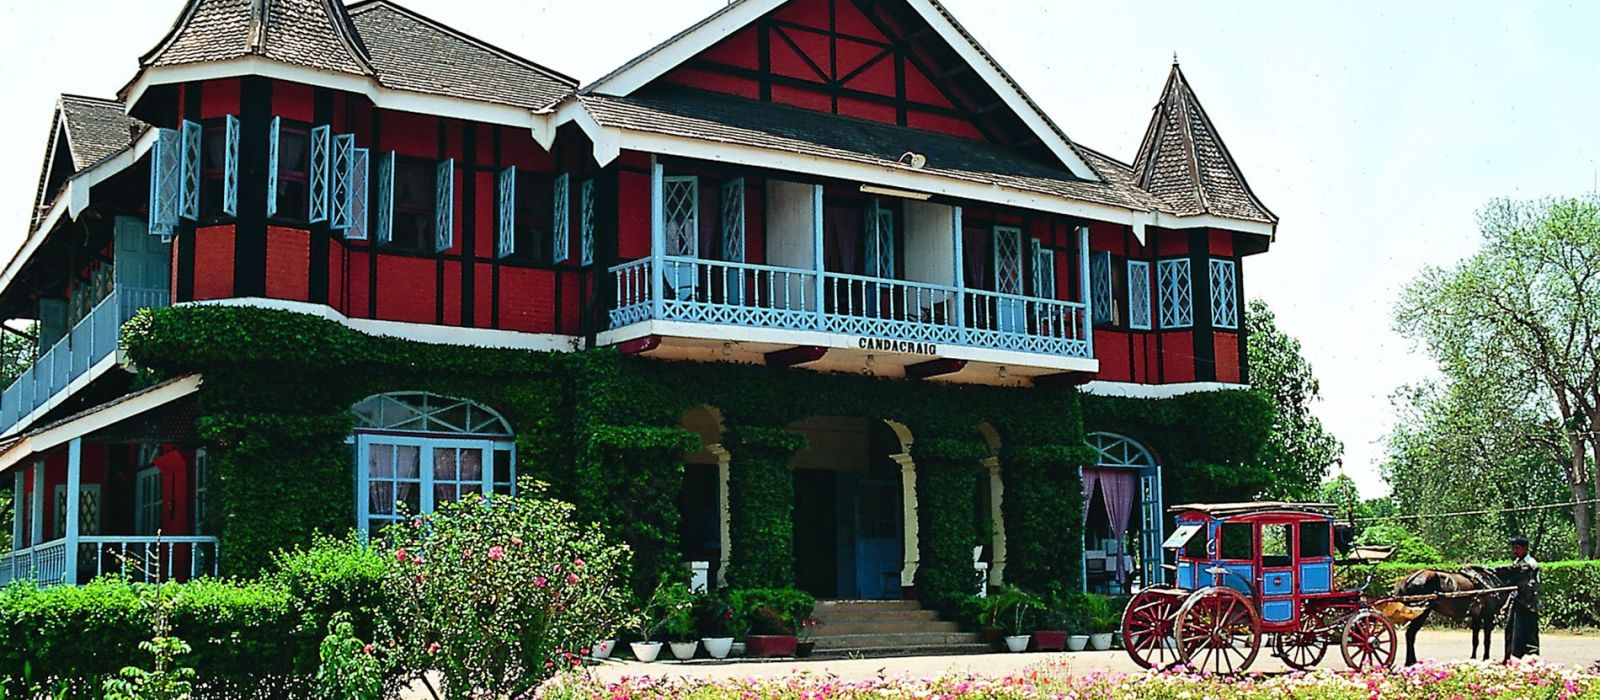 Destination Pyin Oo Lwin Myanmar